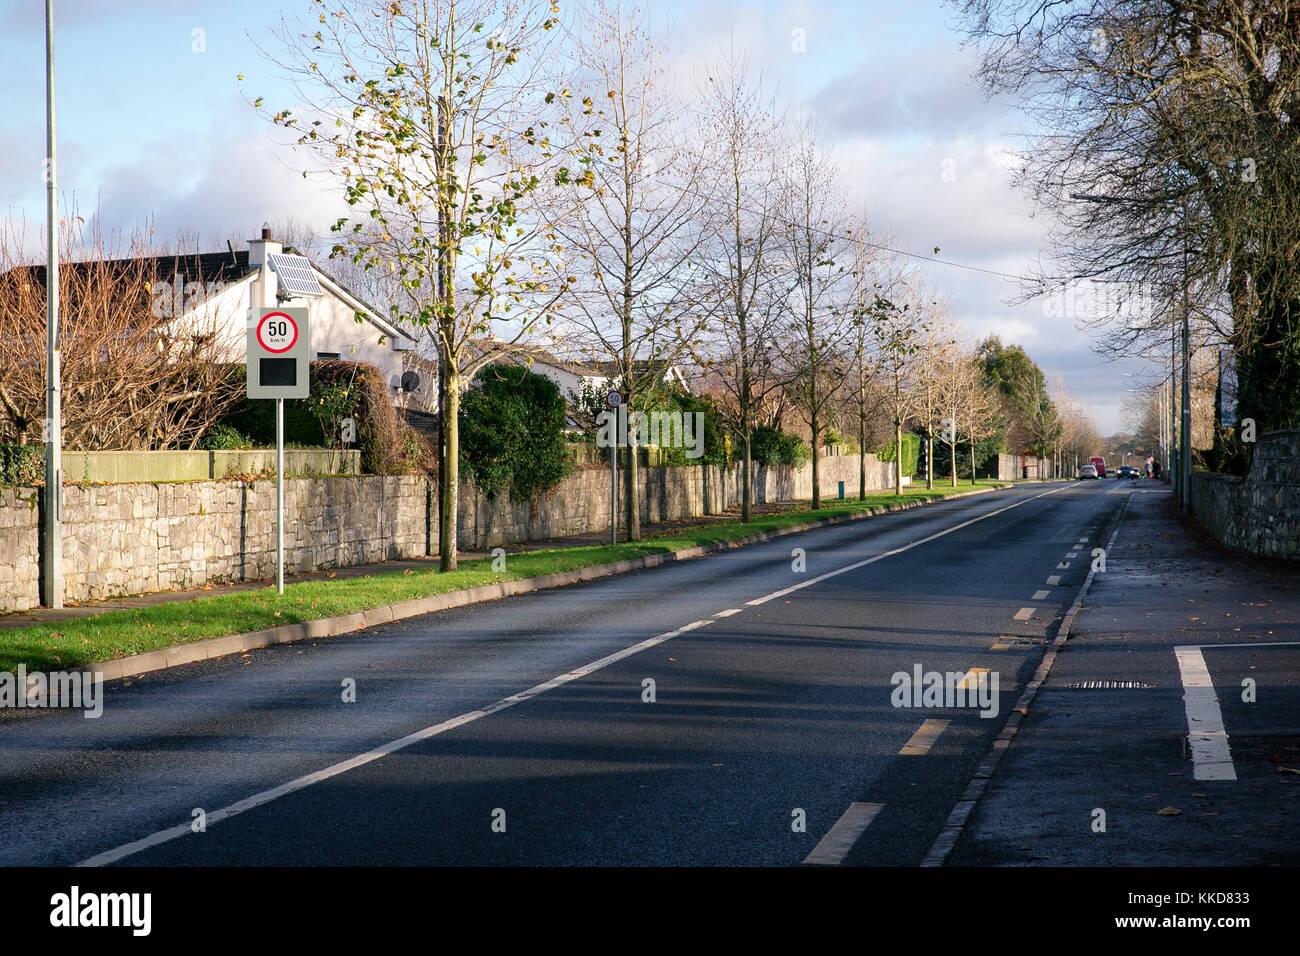 Quiet afternoon on the roads in Celbridge, Co. Kildare, Ireland - Stock Image